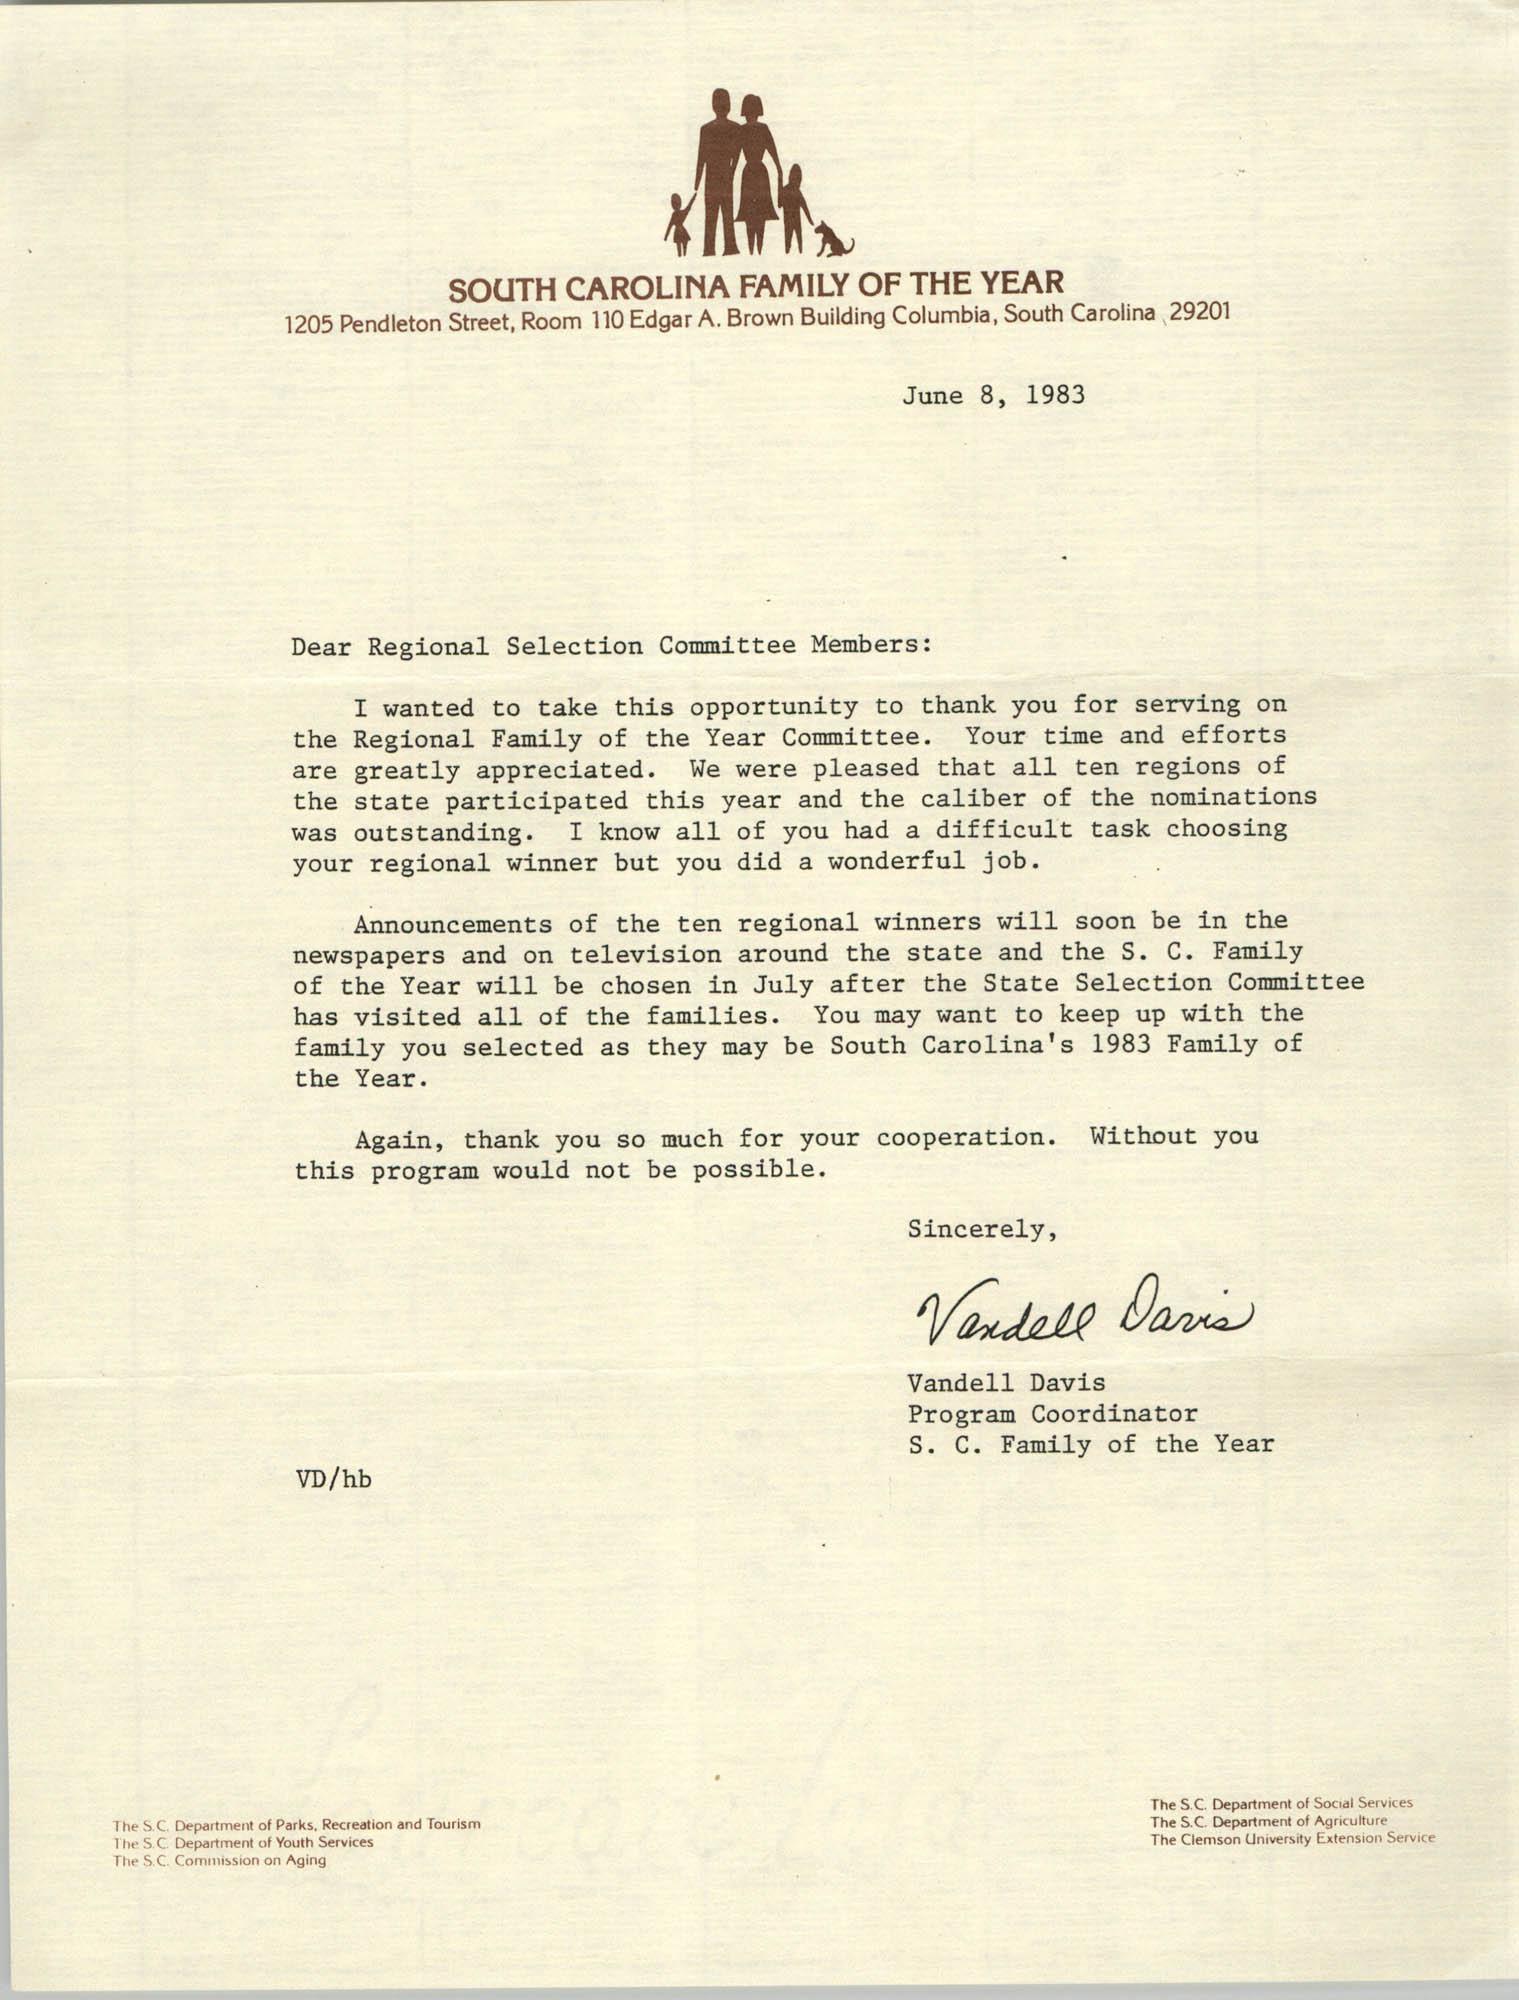 Letter from Vandell Davis to Regional Selection Committee Members, June 8, 1983